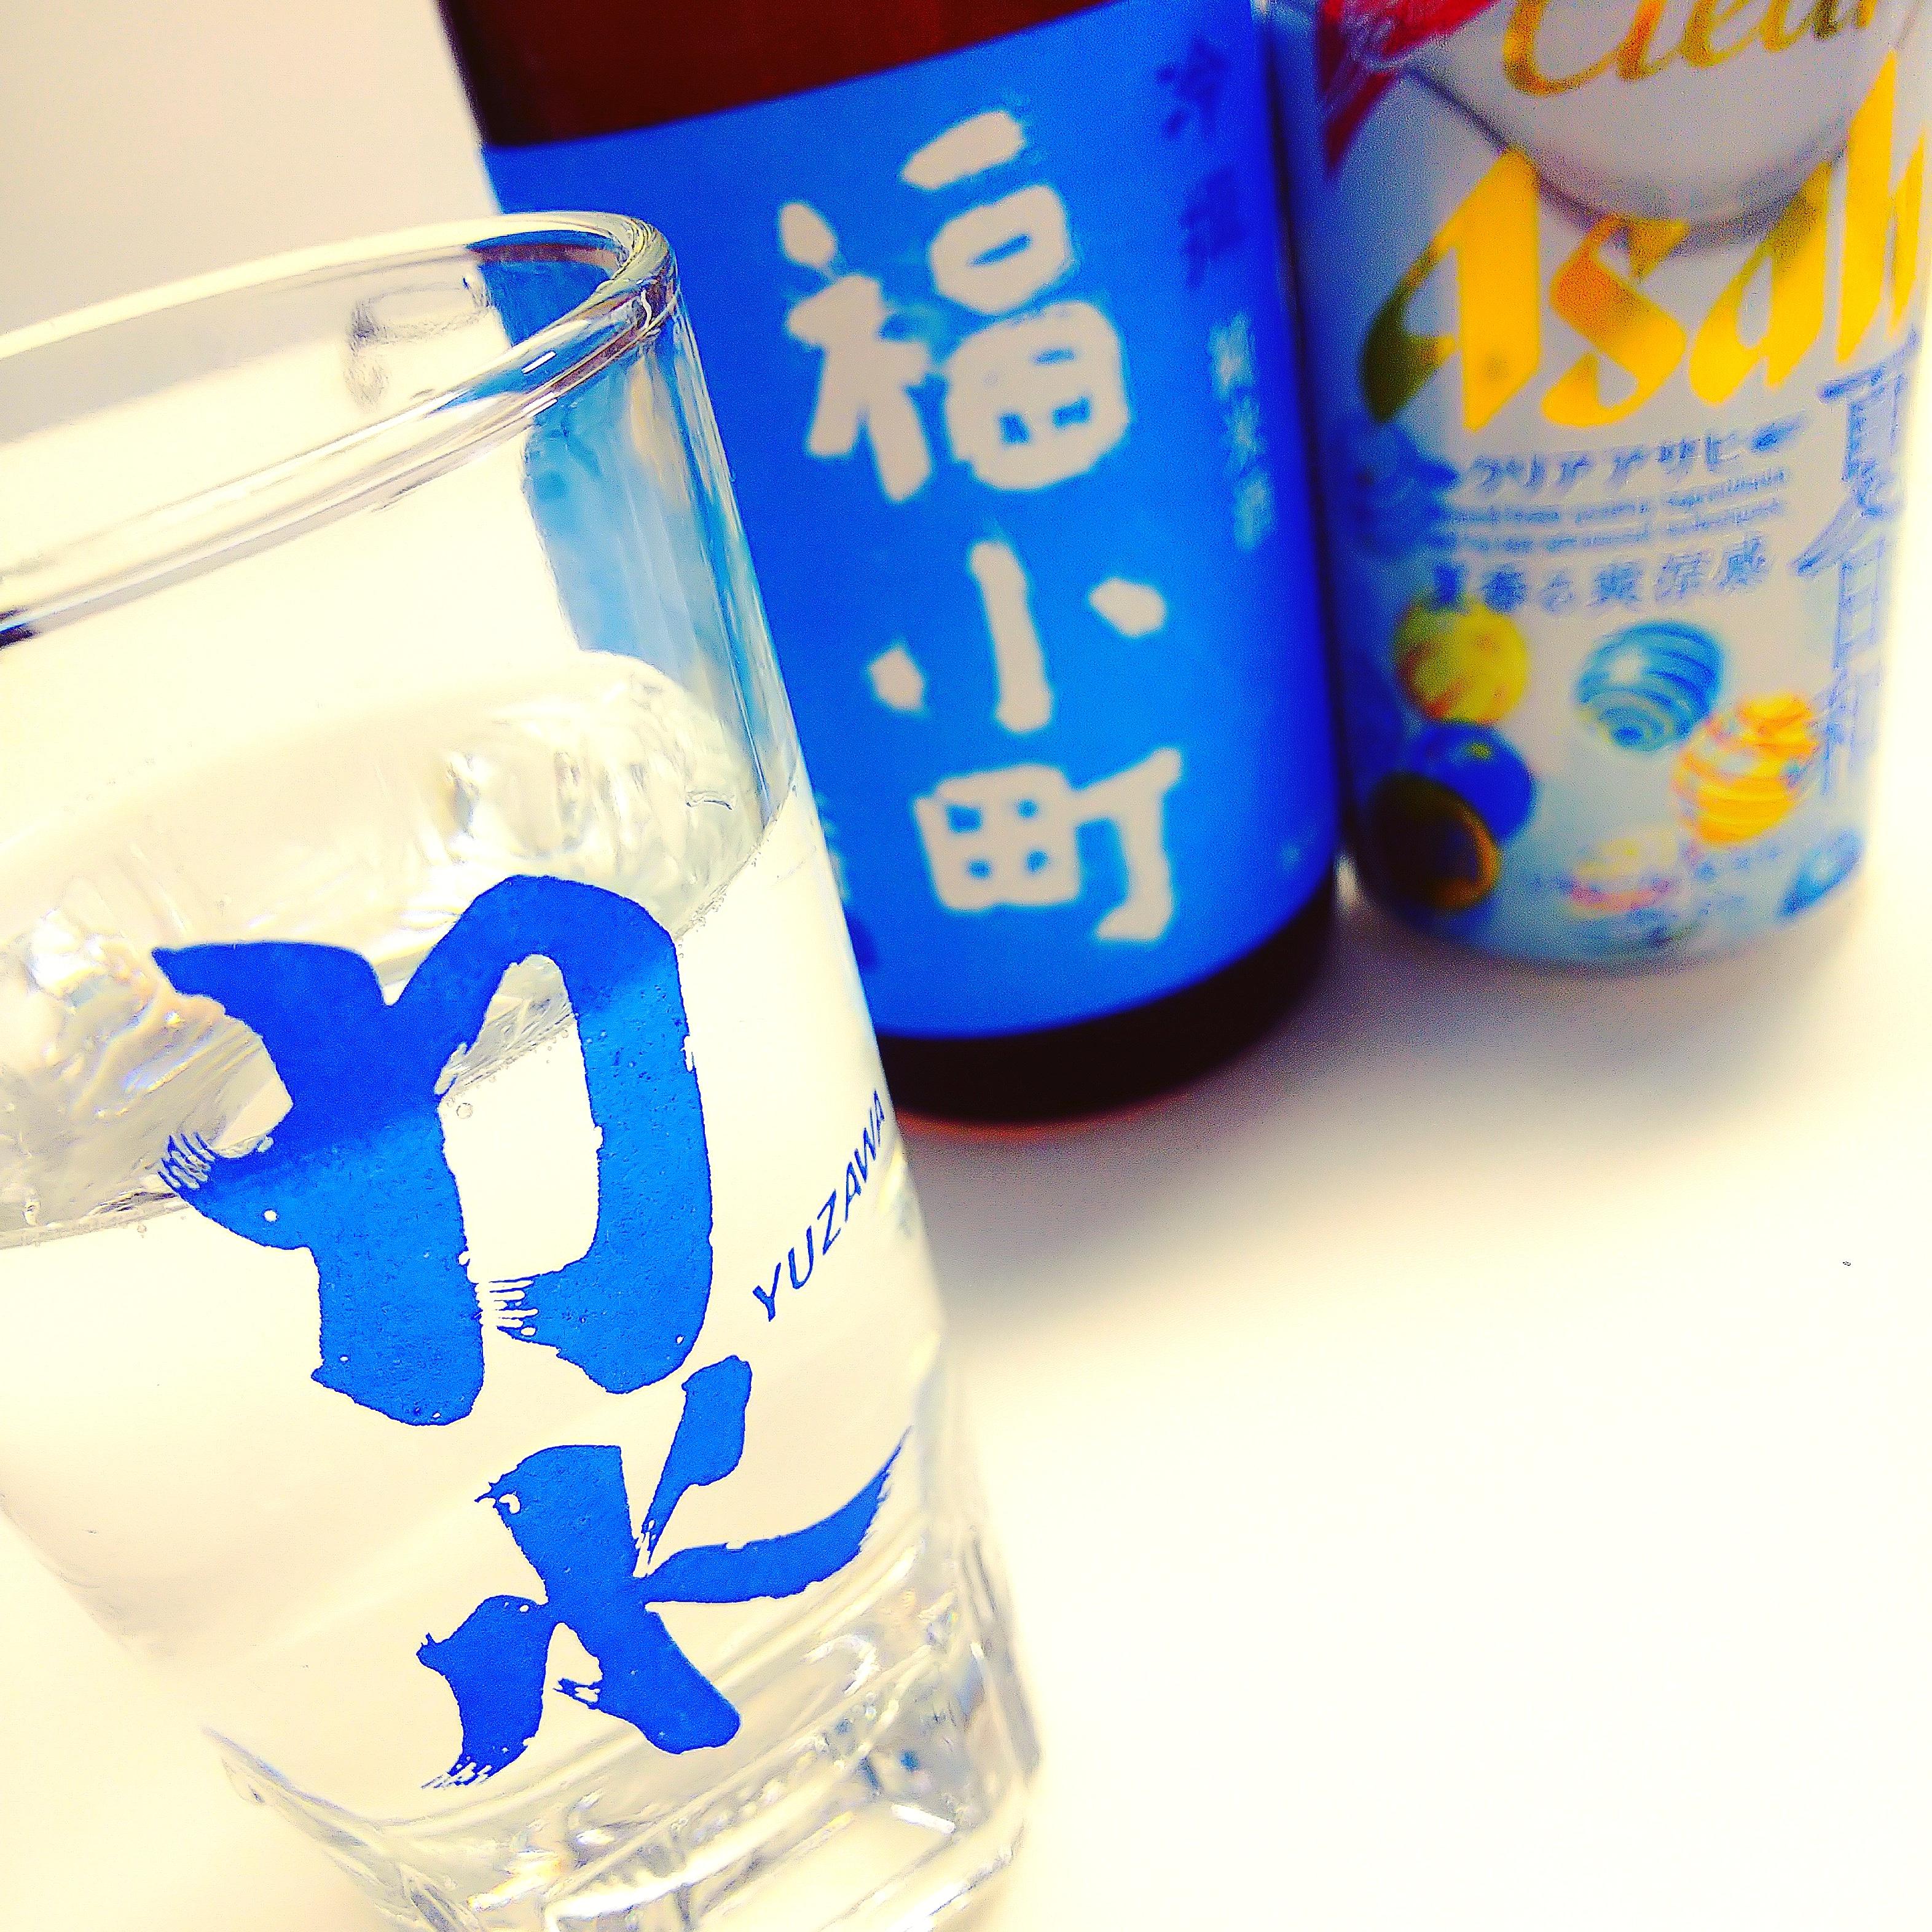 http://www.fukukomachi.com/blog/photo/IMG_20200530_210629_851.jpg